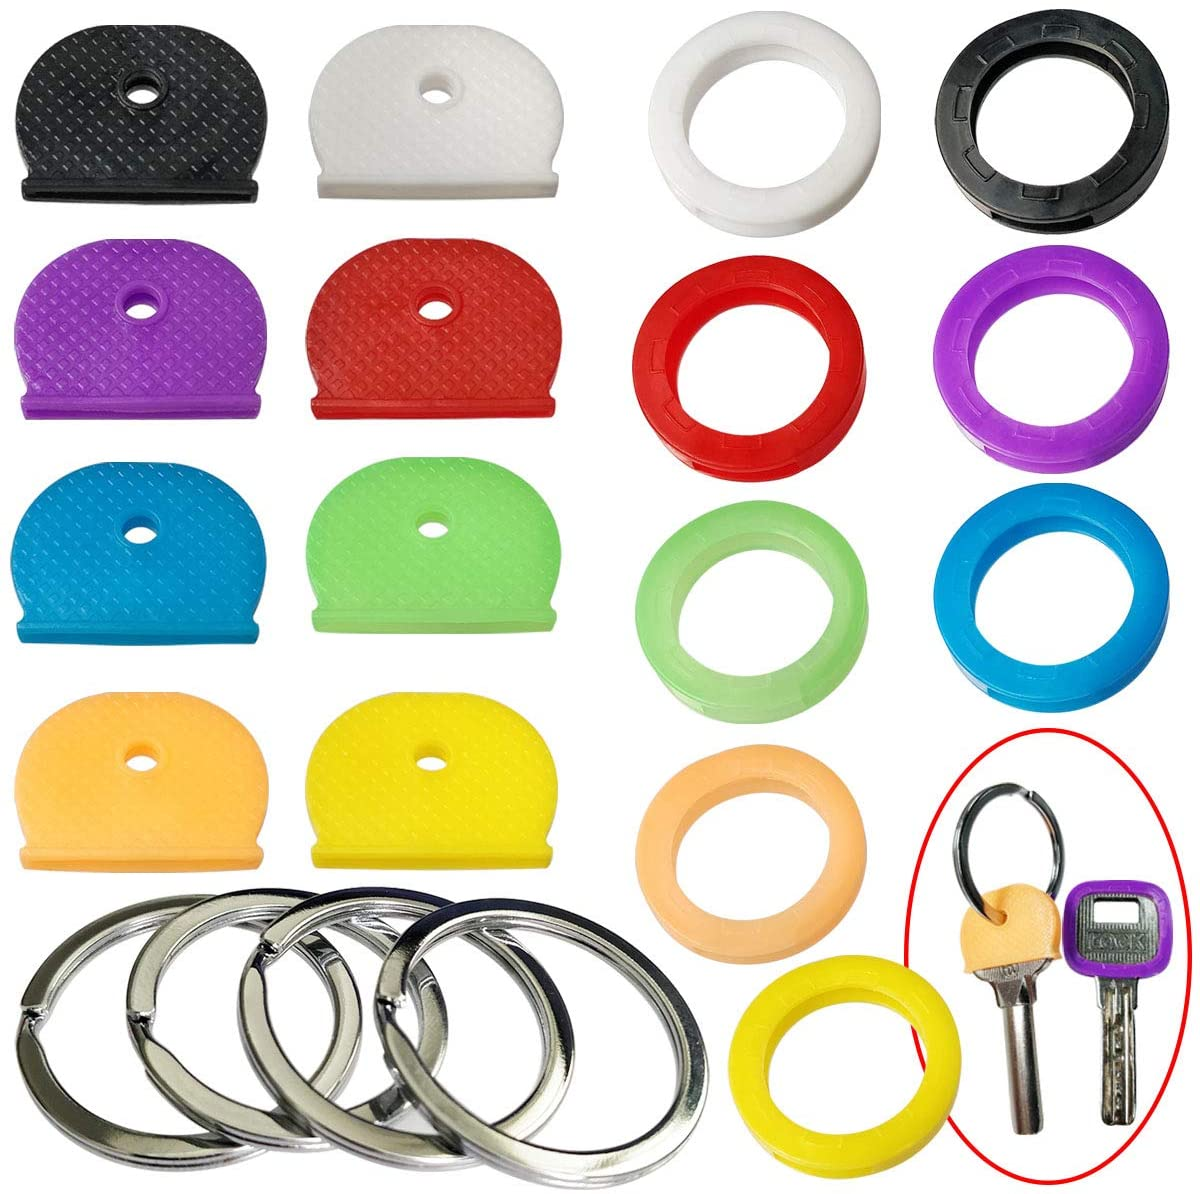 Tampas de chave tampas tags cor codificada chave cabeça caps etiqueta id chave codificada anéis identificar chaves